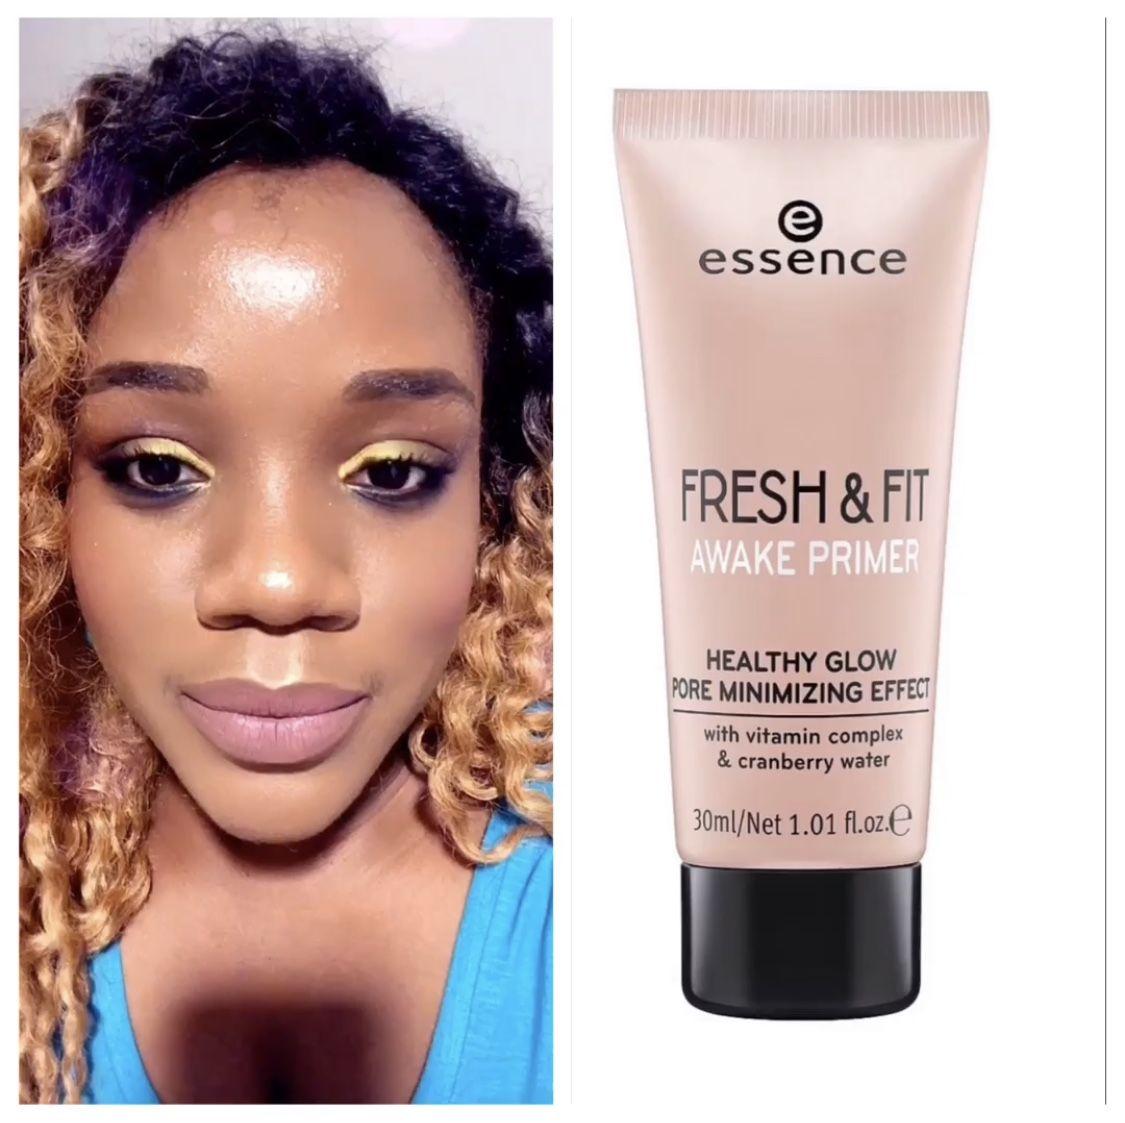 Essence Fresh Fit Awake Primer Healthy Glow Photo Makeup